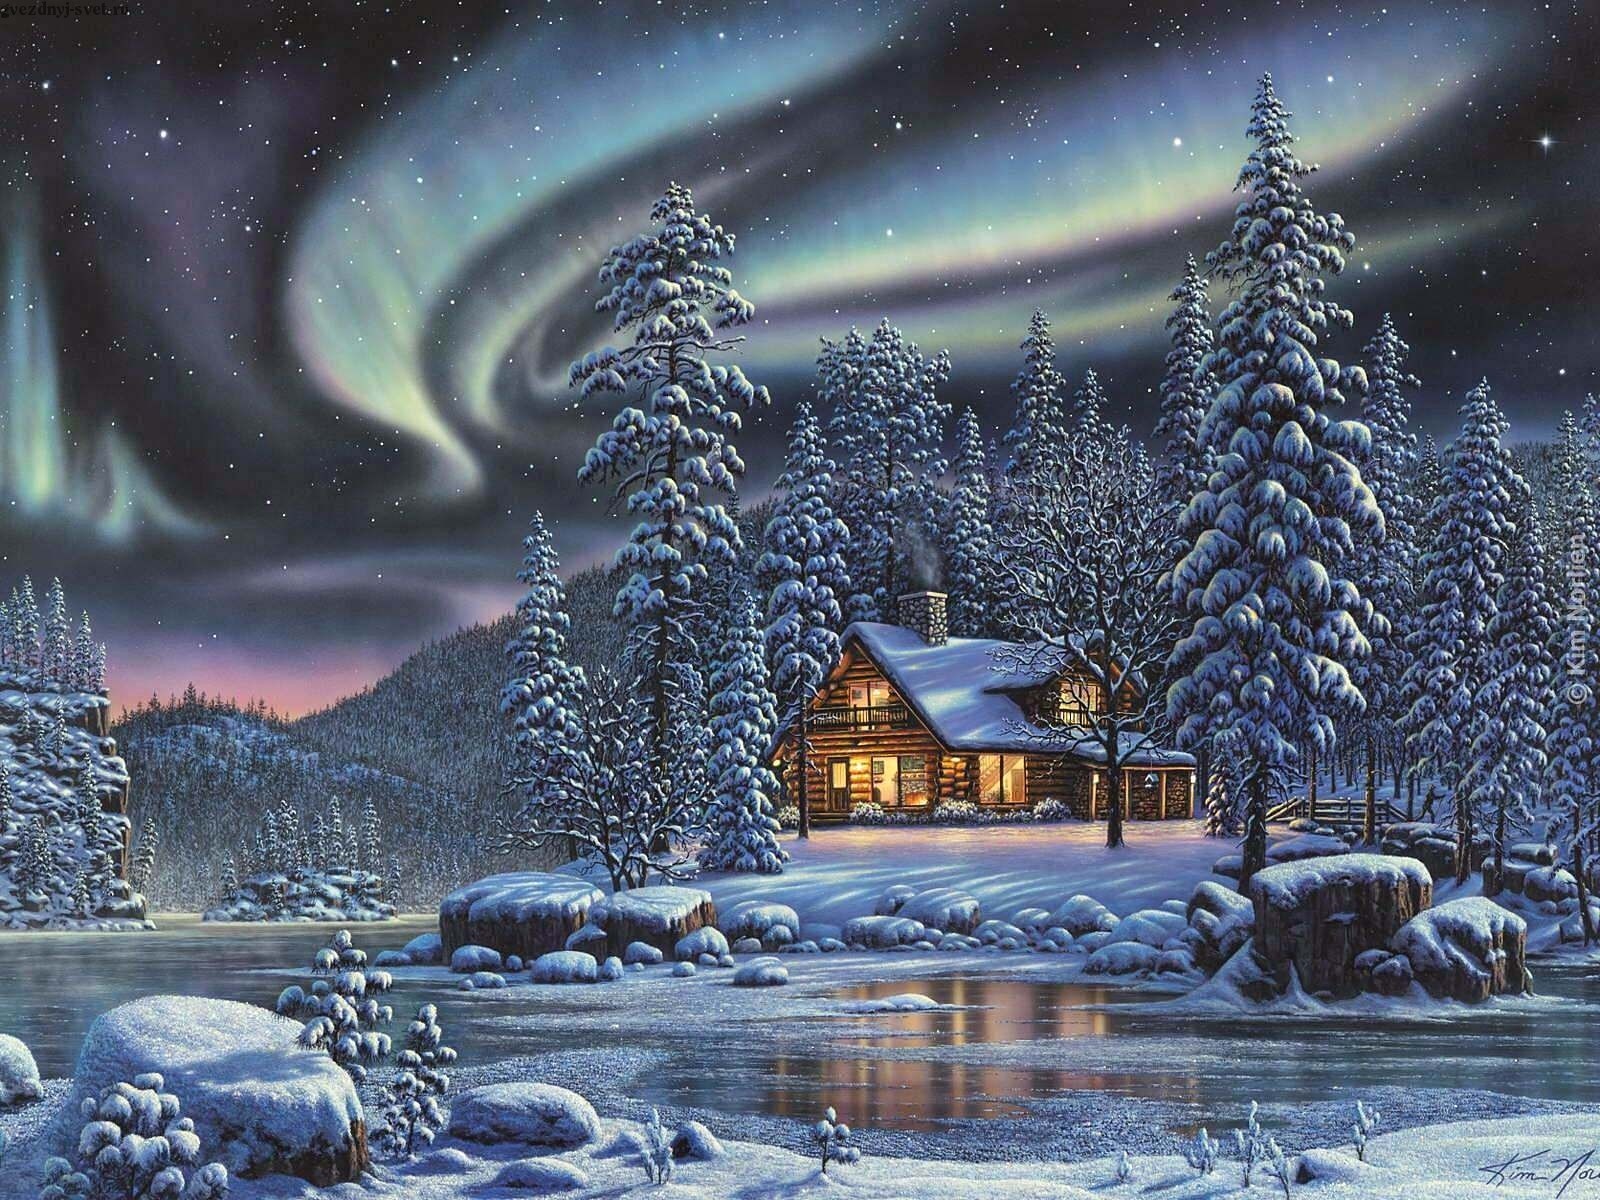 Artistique - Hiver  - Aurora Borealis Winter Fond d'écran